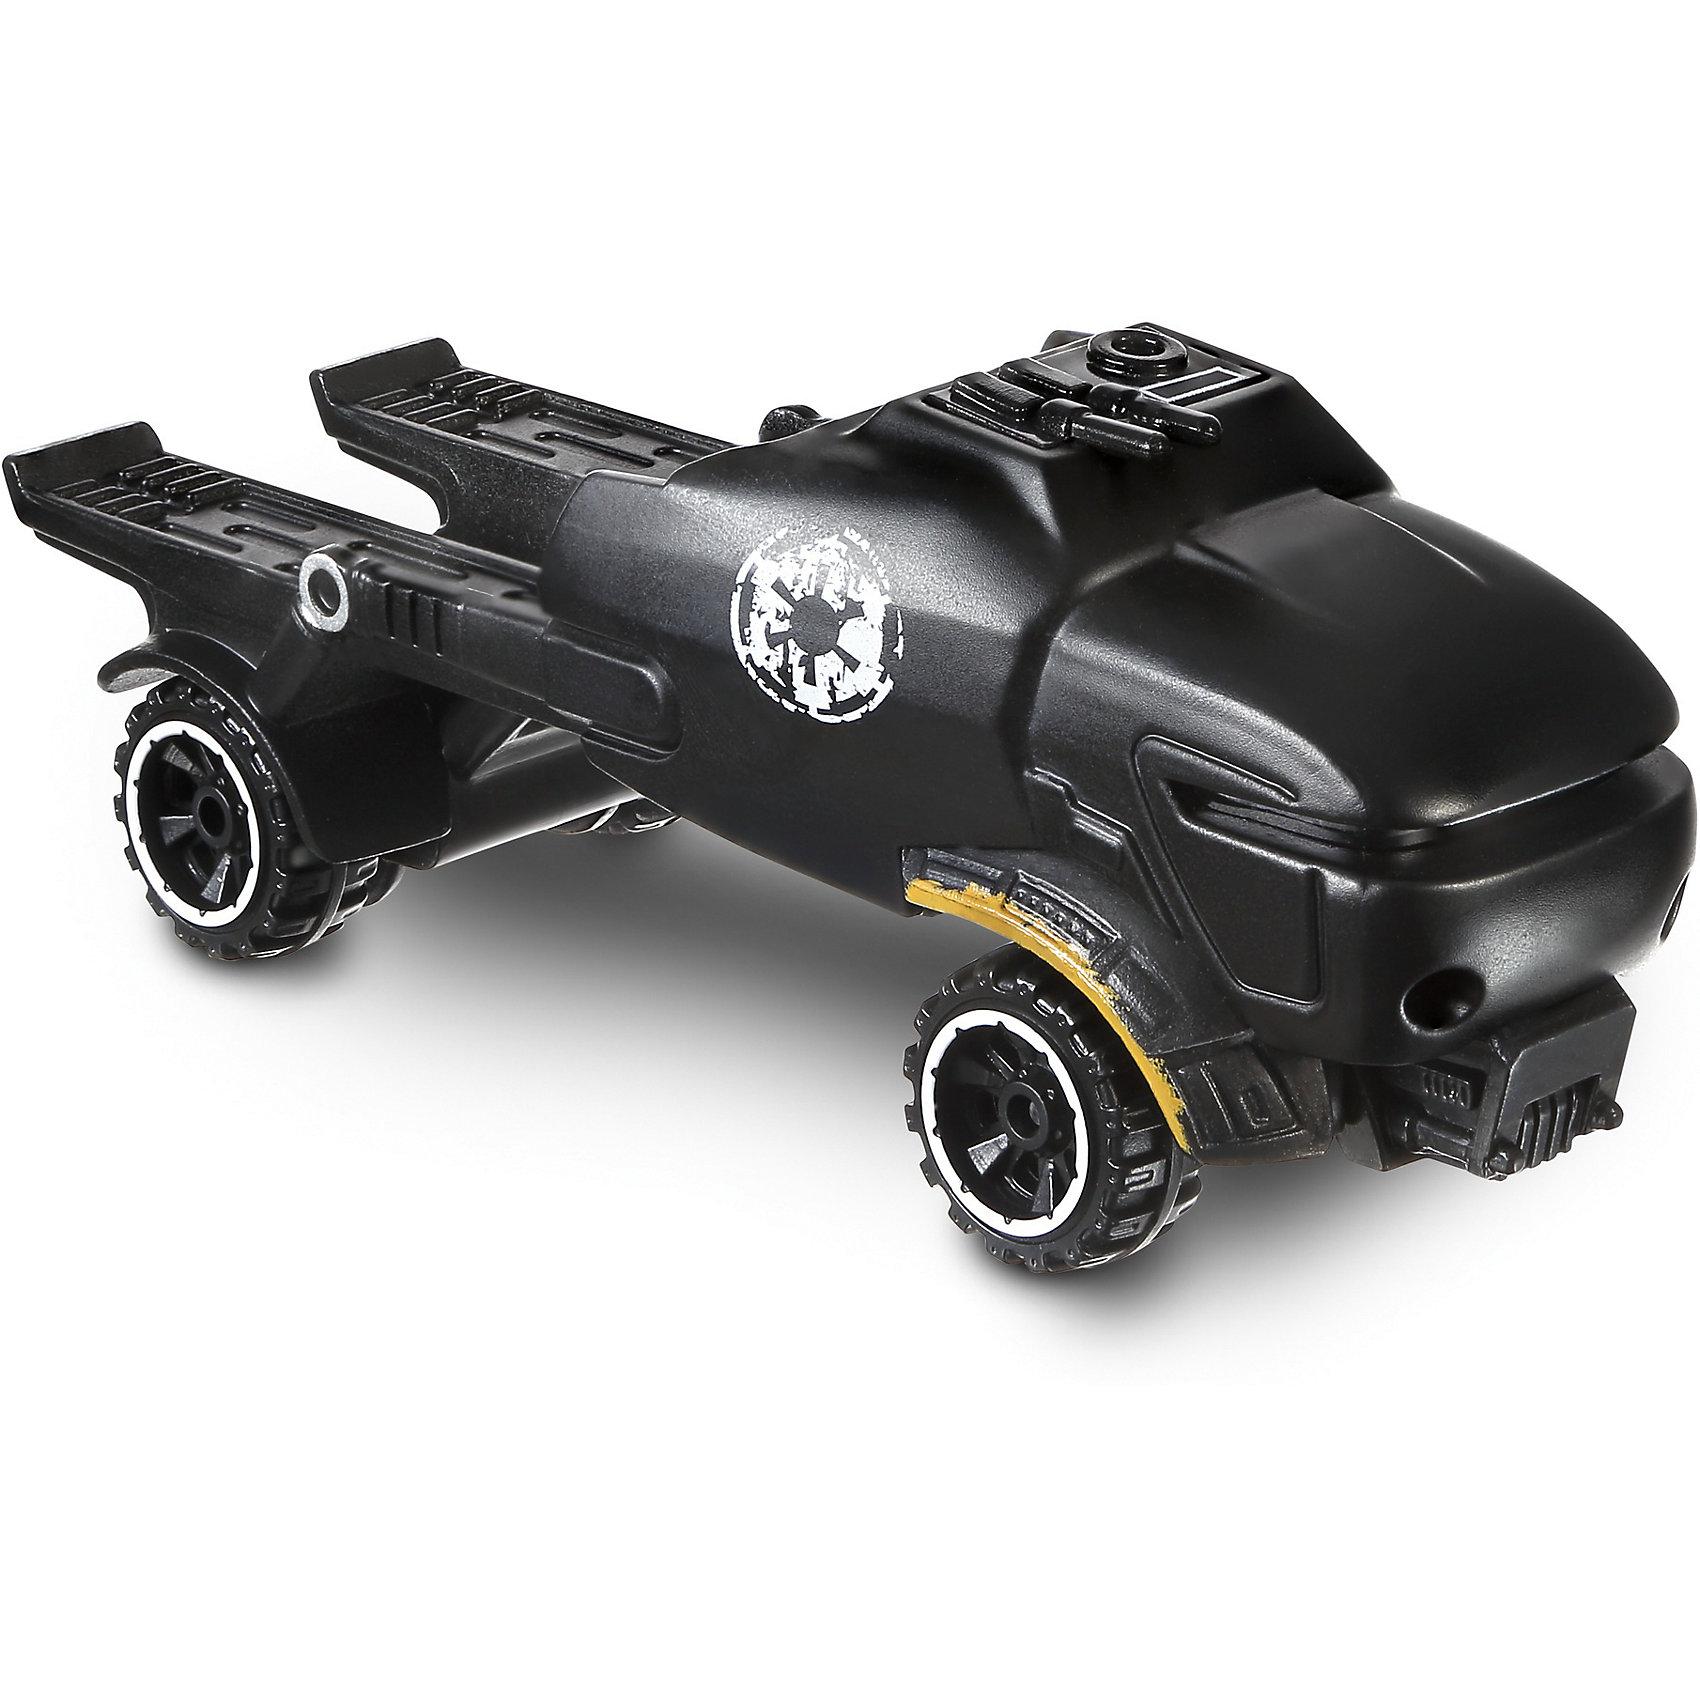 Машинка R1 Seal Droid SW, Hot WheelsПопулярные игрушки<br><br><br>Ширина мм: 140<br>Глубина мм: 40<br>Высота мм: 165<br>Вес г: 91<br>Возраст от месяцев: 36<br>Возраст до месяцев: 72<br>Пол: Мужской<br>Возраст: Детский<br>SKU: 5440259